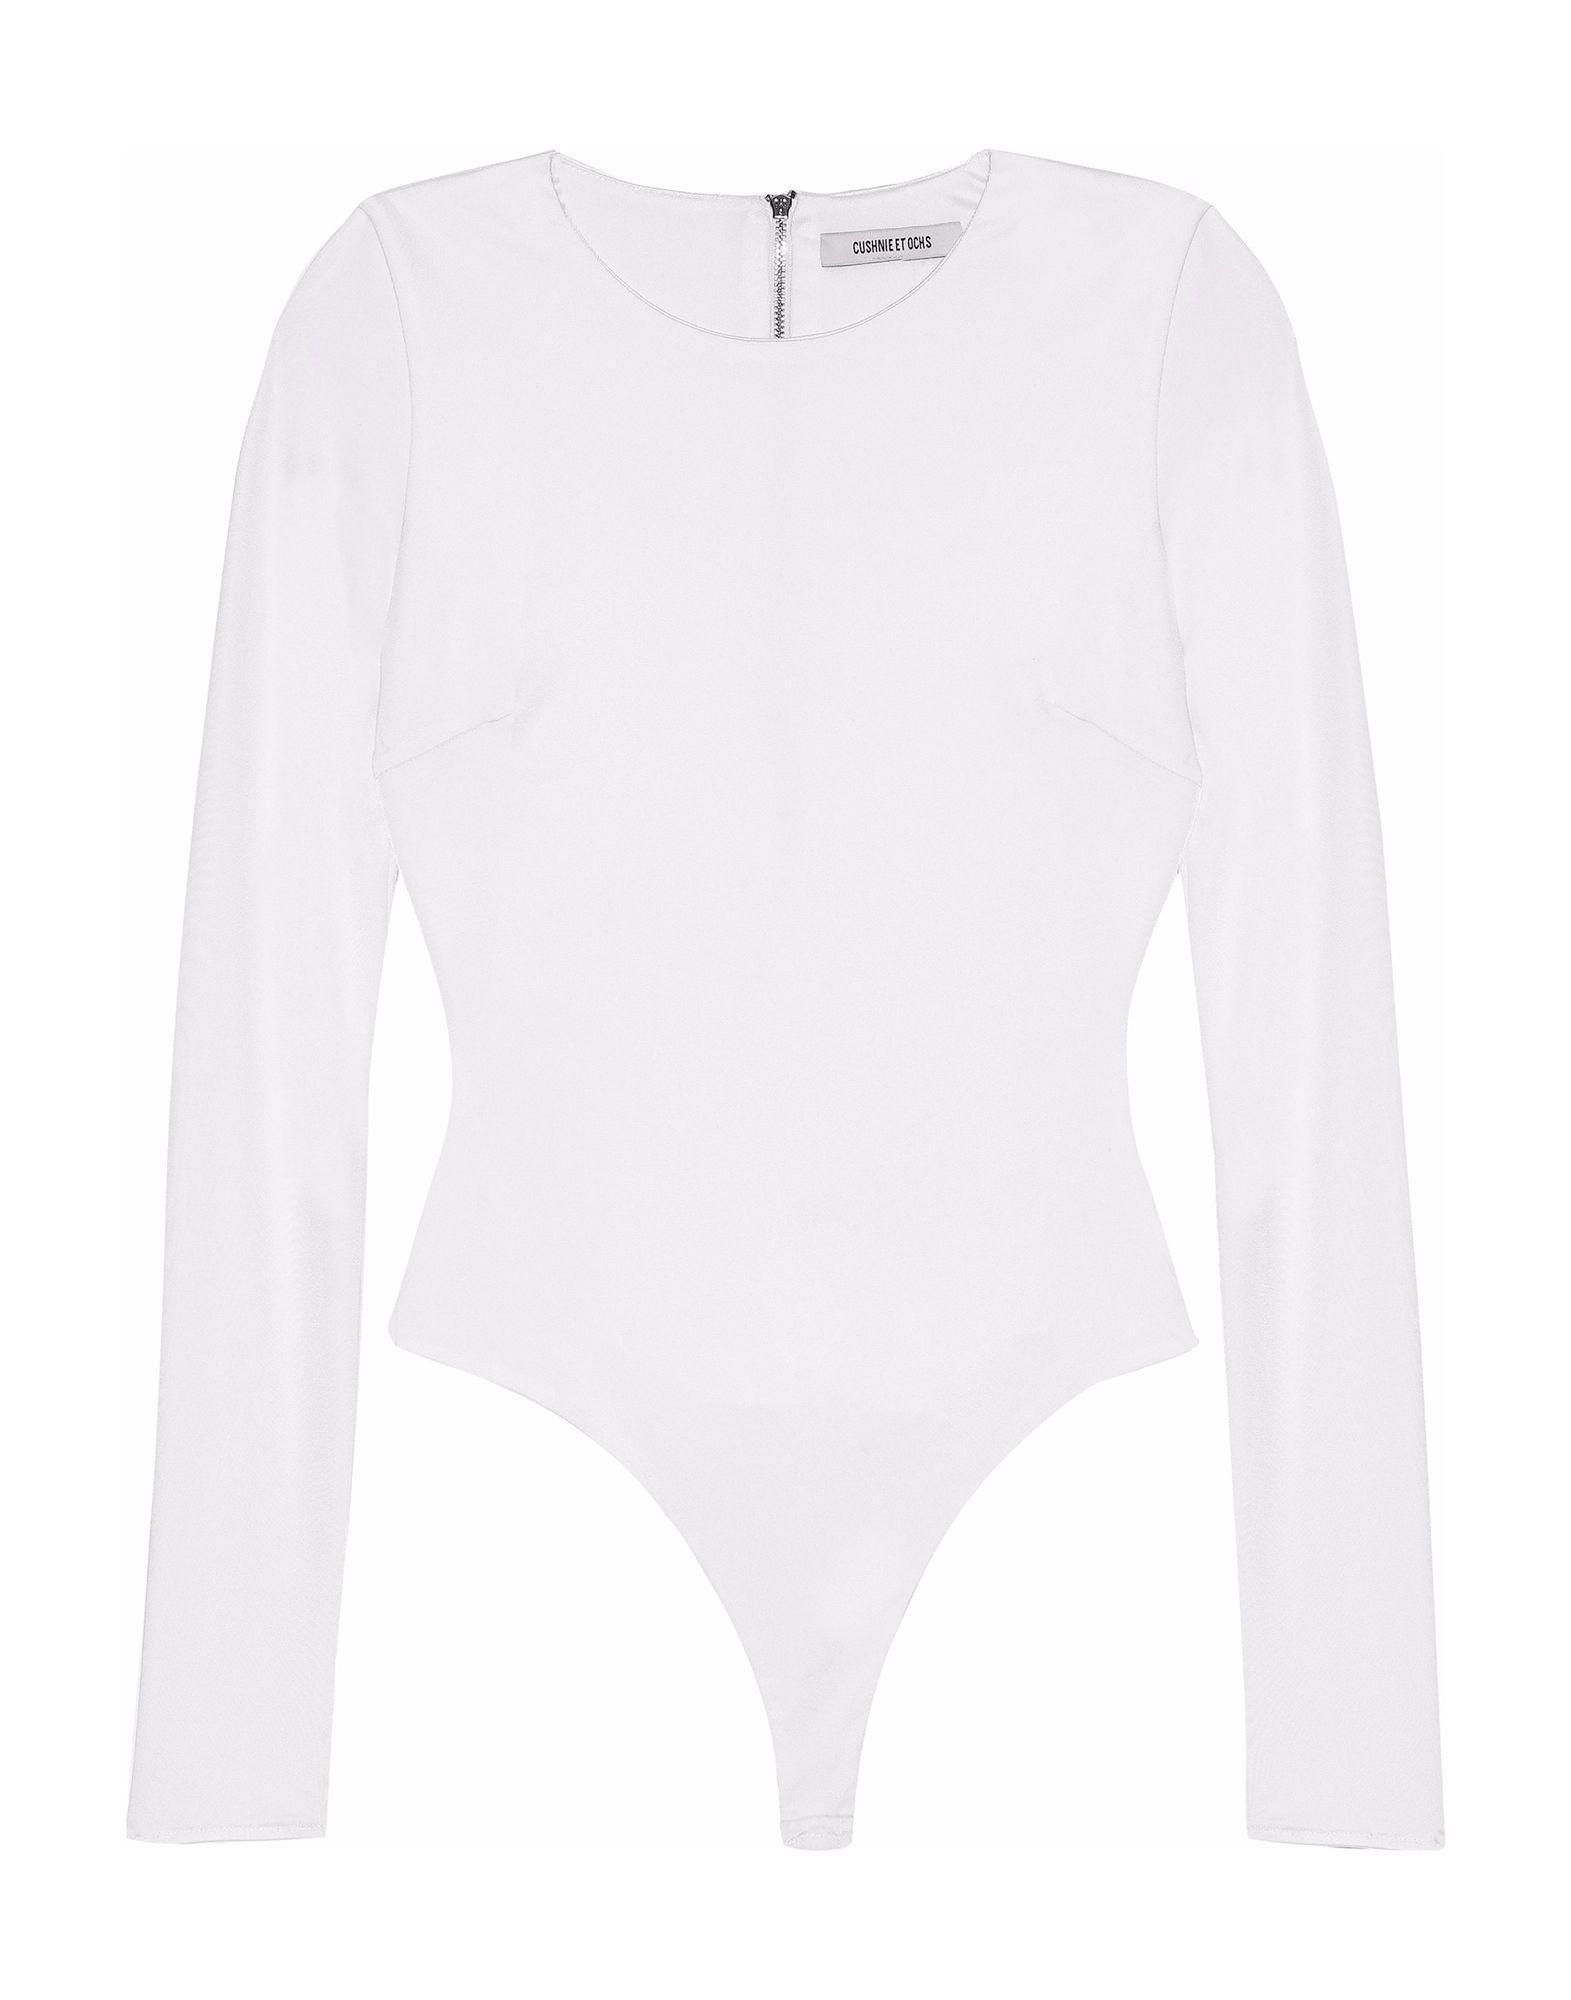 a4e459c7ca41e Lyst - Cushnie et Ochs T-shirt in White